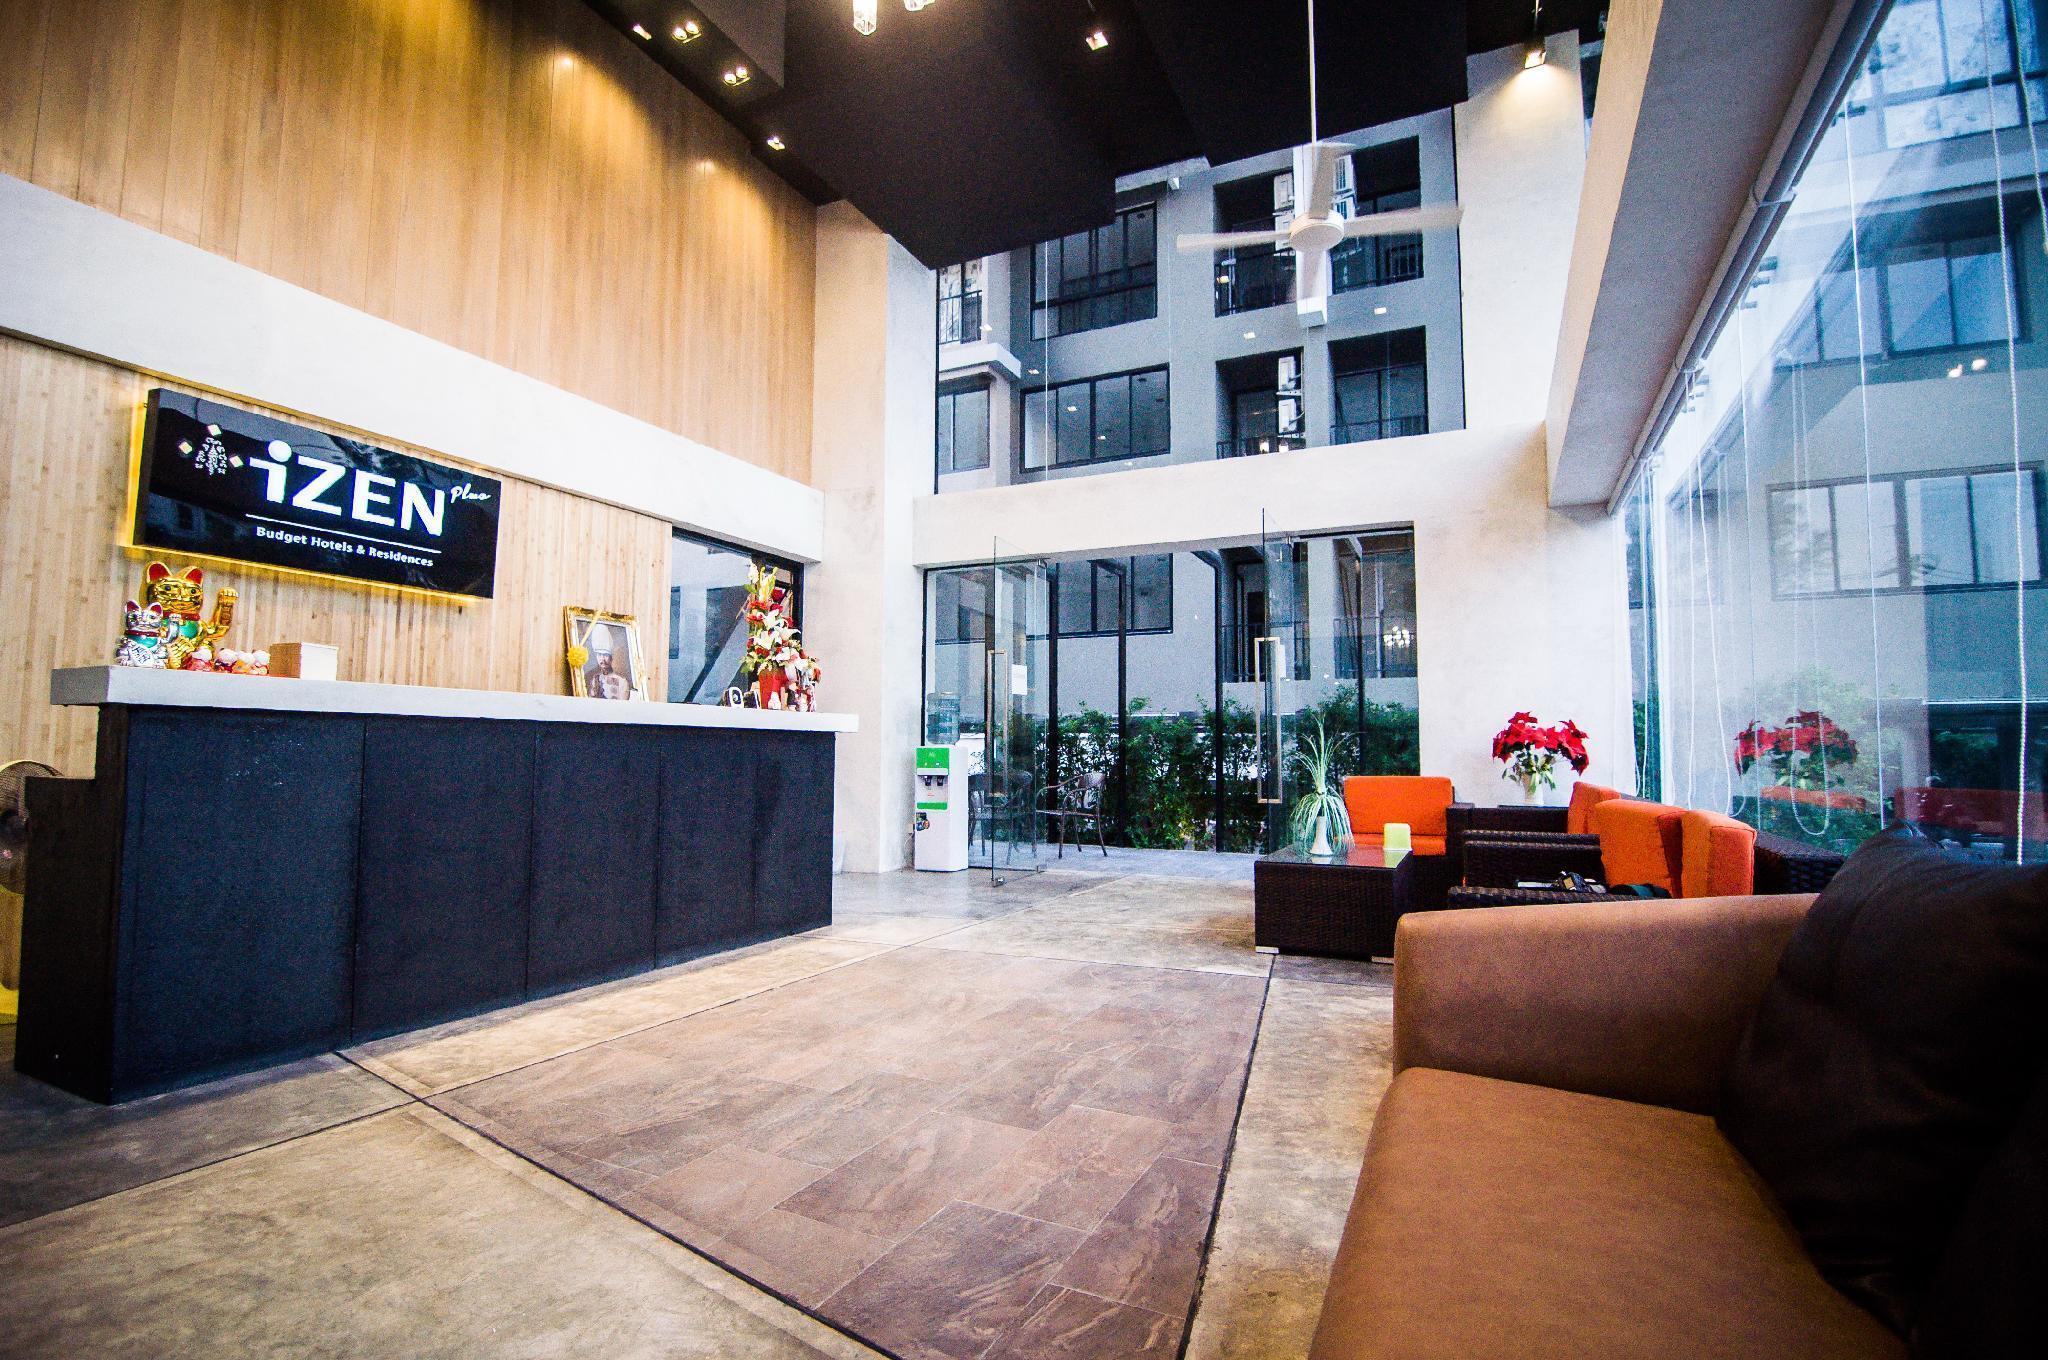 IZEN Budget Hotel & Residences (Plus) ไอเซน บัดเจ็ทโฮเต็ล แอนด์ เรสซิเดนซ์ (พลัส)